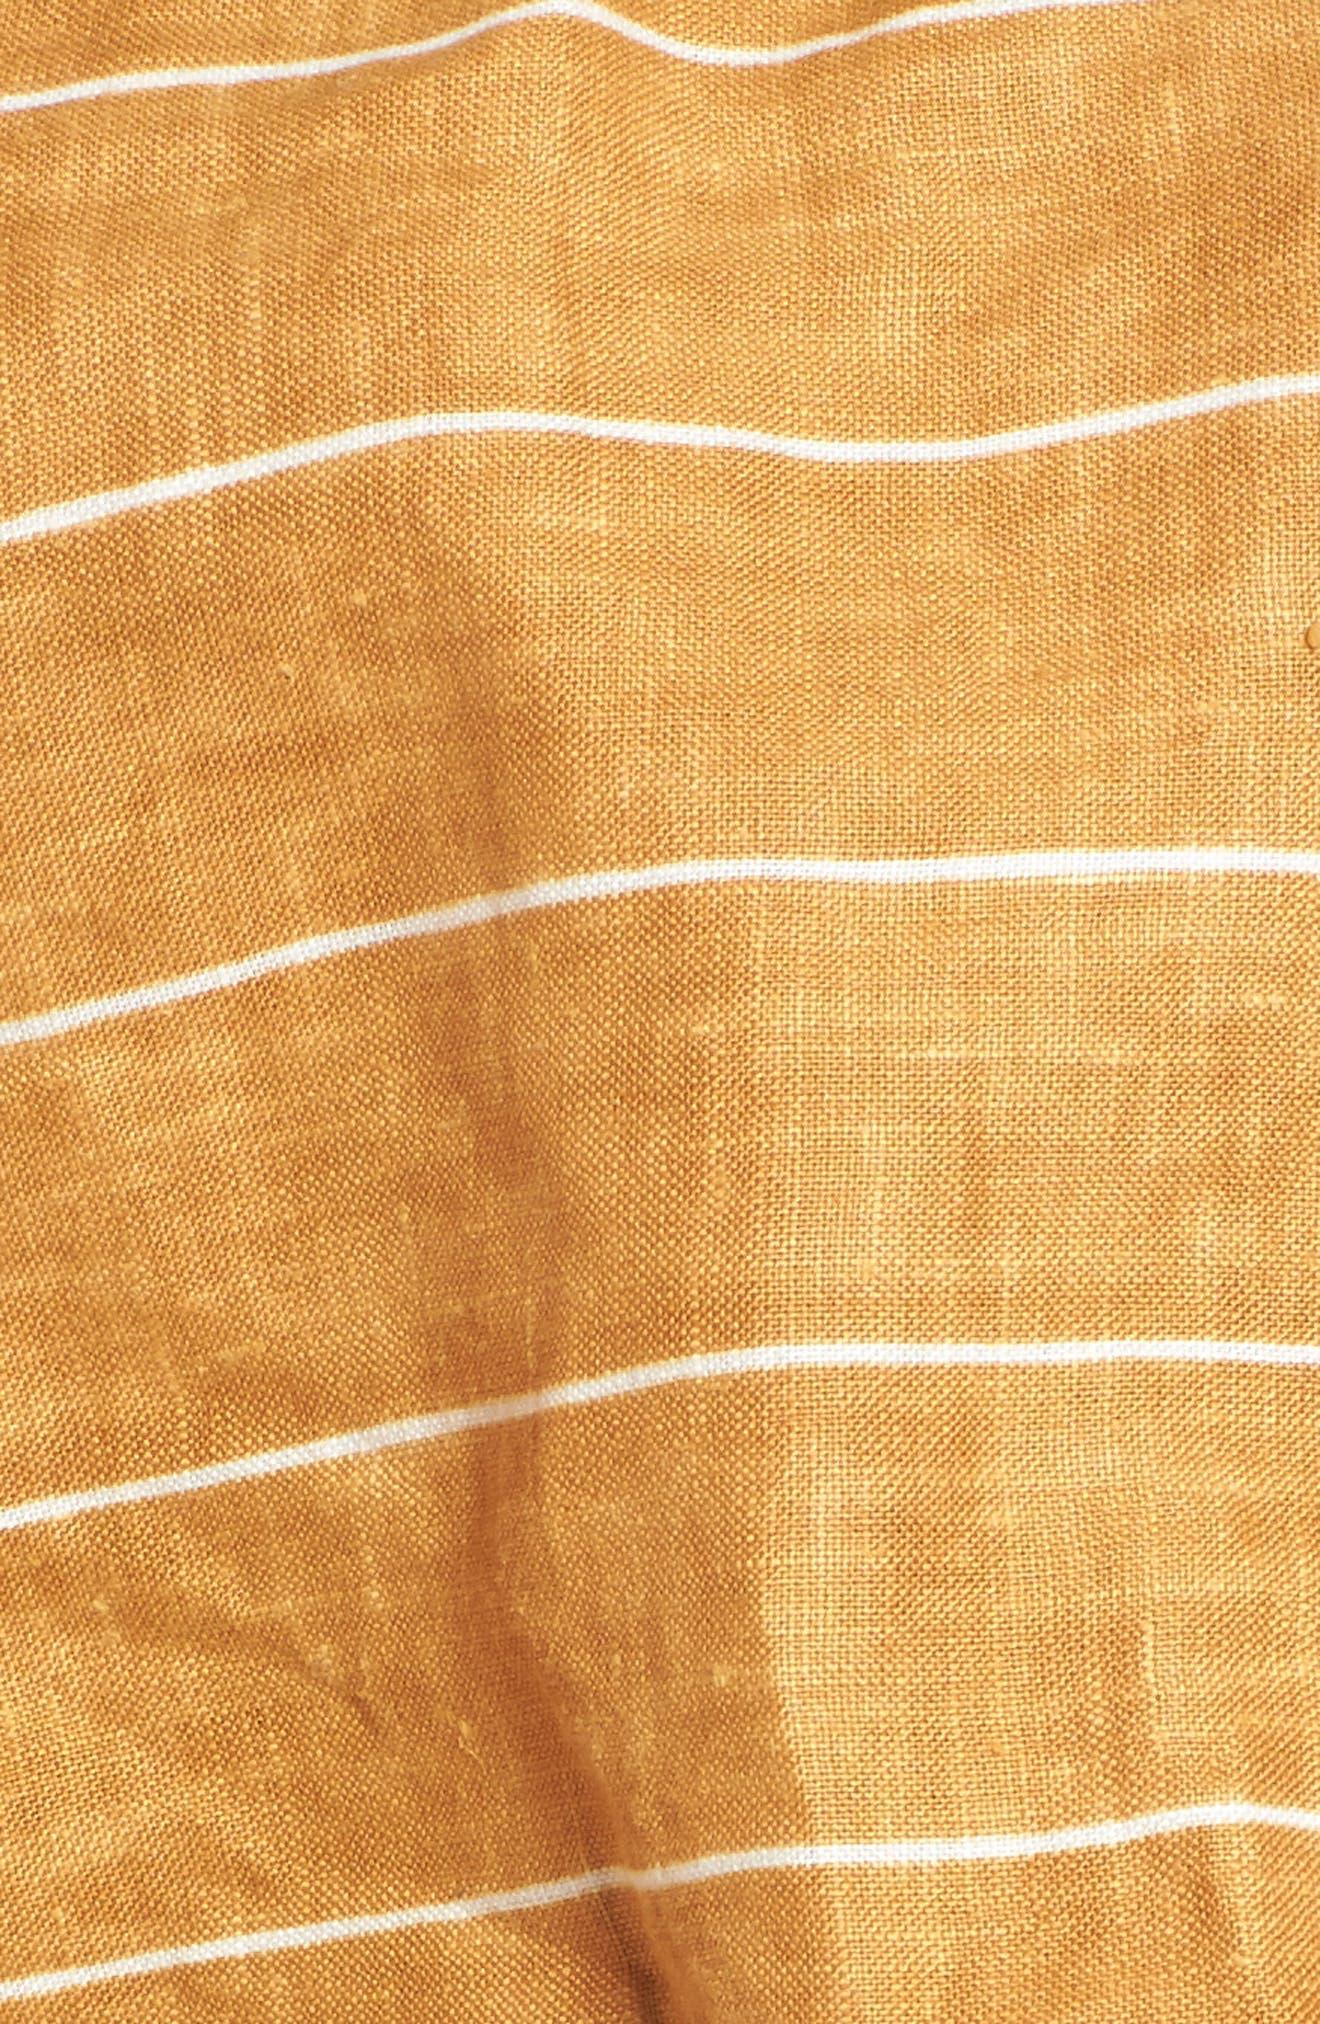 Solana Stripe Strapless Linen Crop Top,                             Alternate thumbnail 6, color,                             Copenhagen Stripe